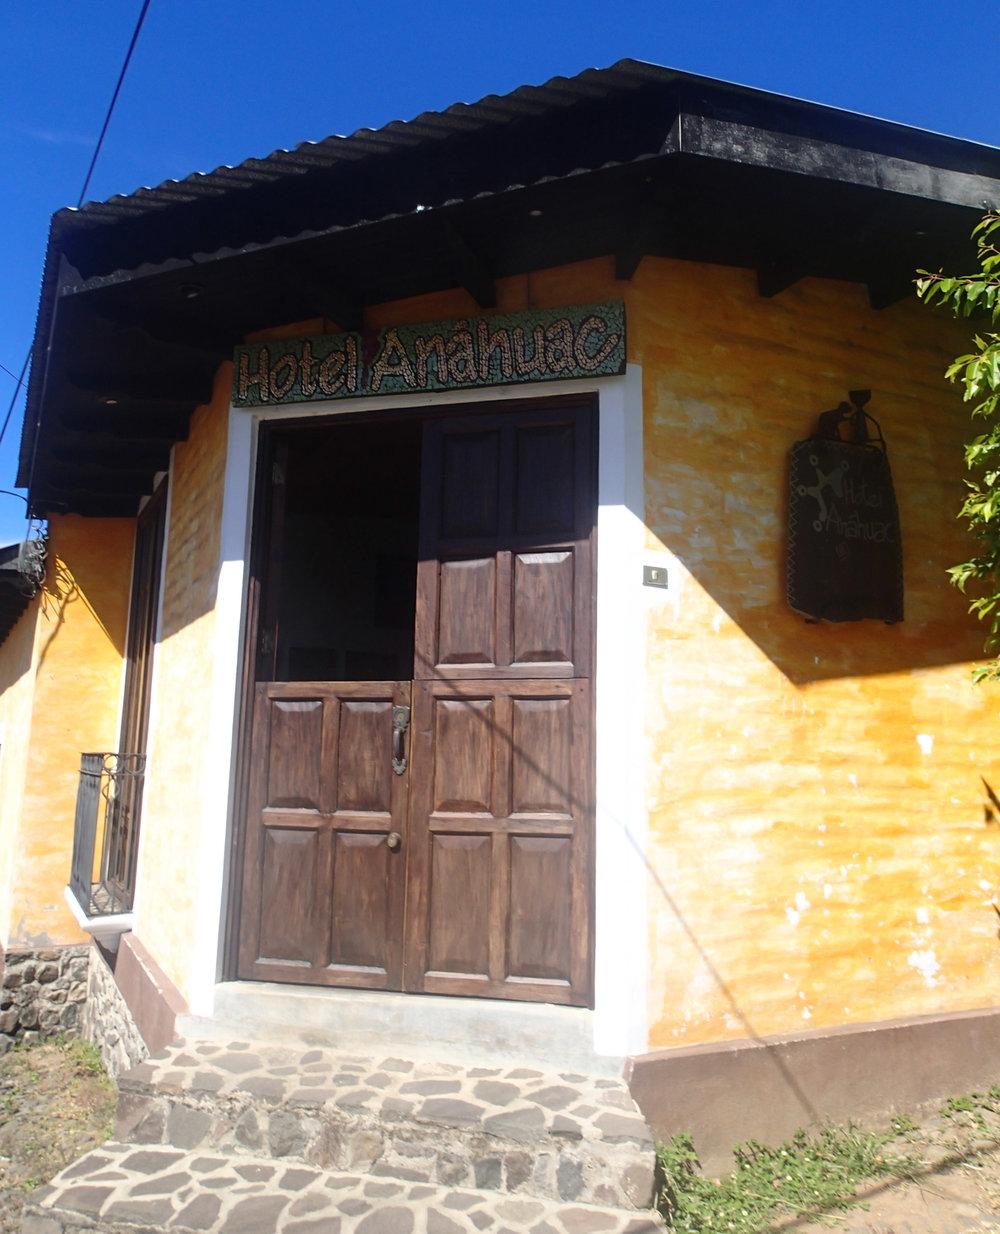 Hotel Anahuac 12-12-14.jpg